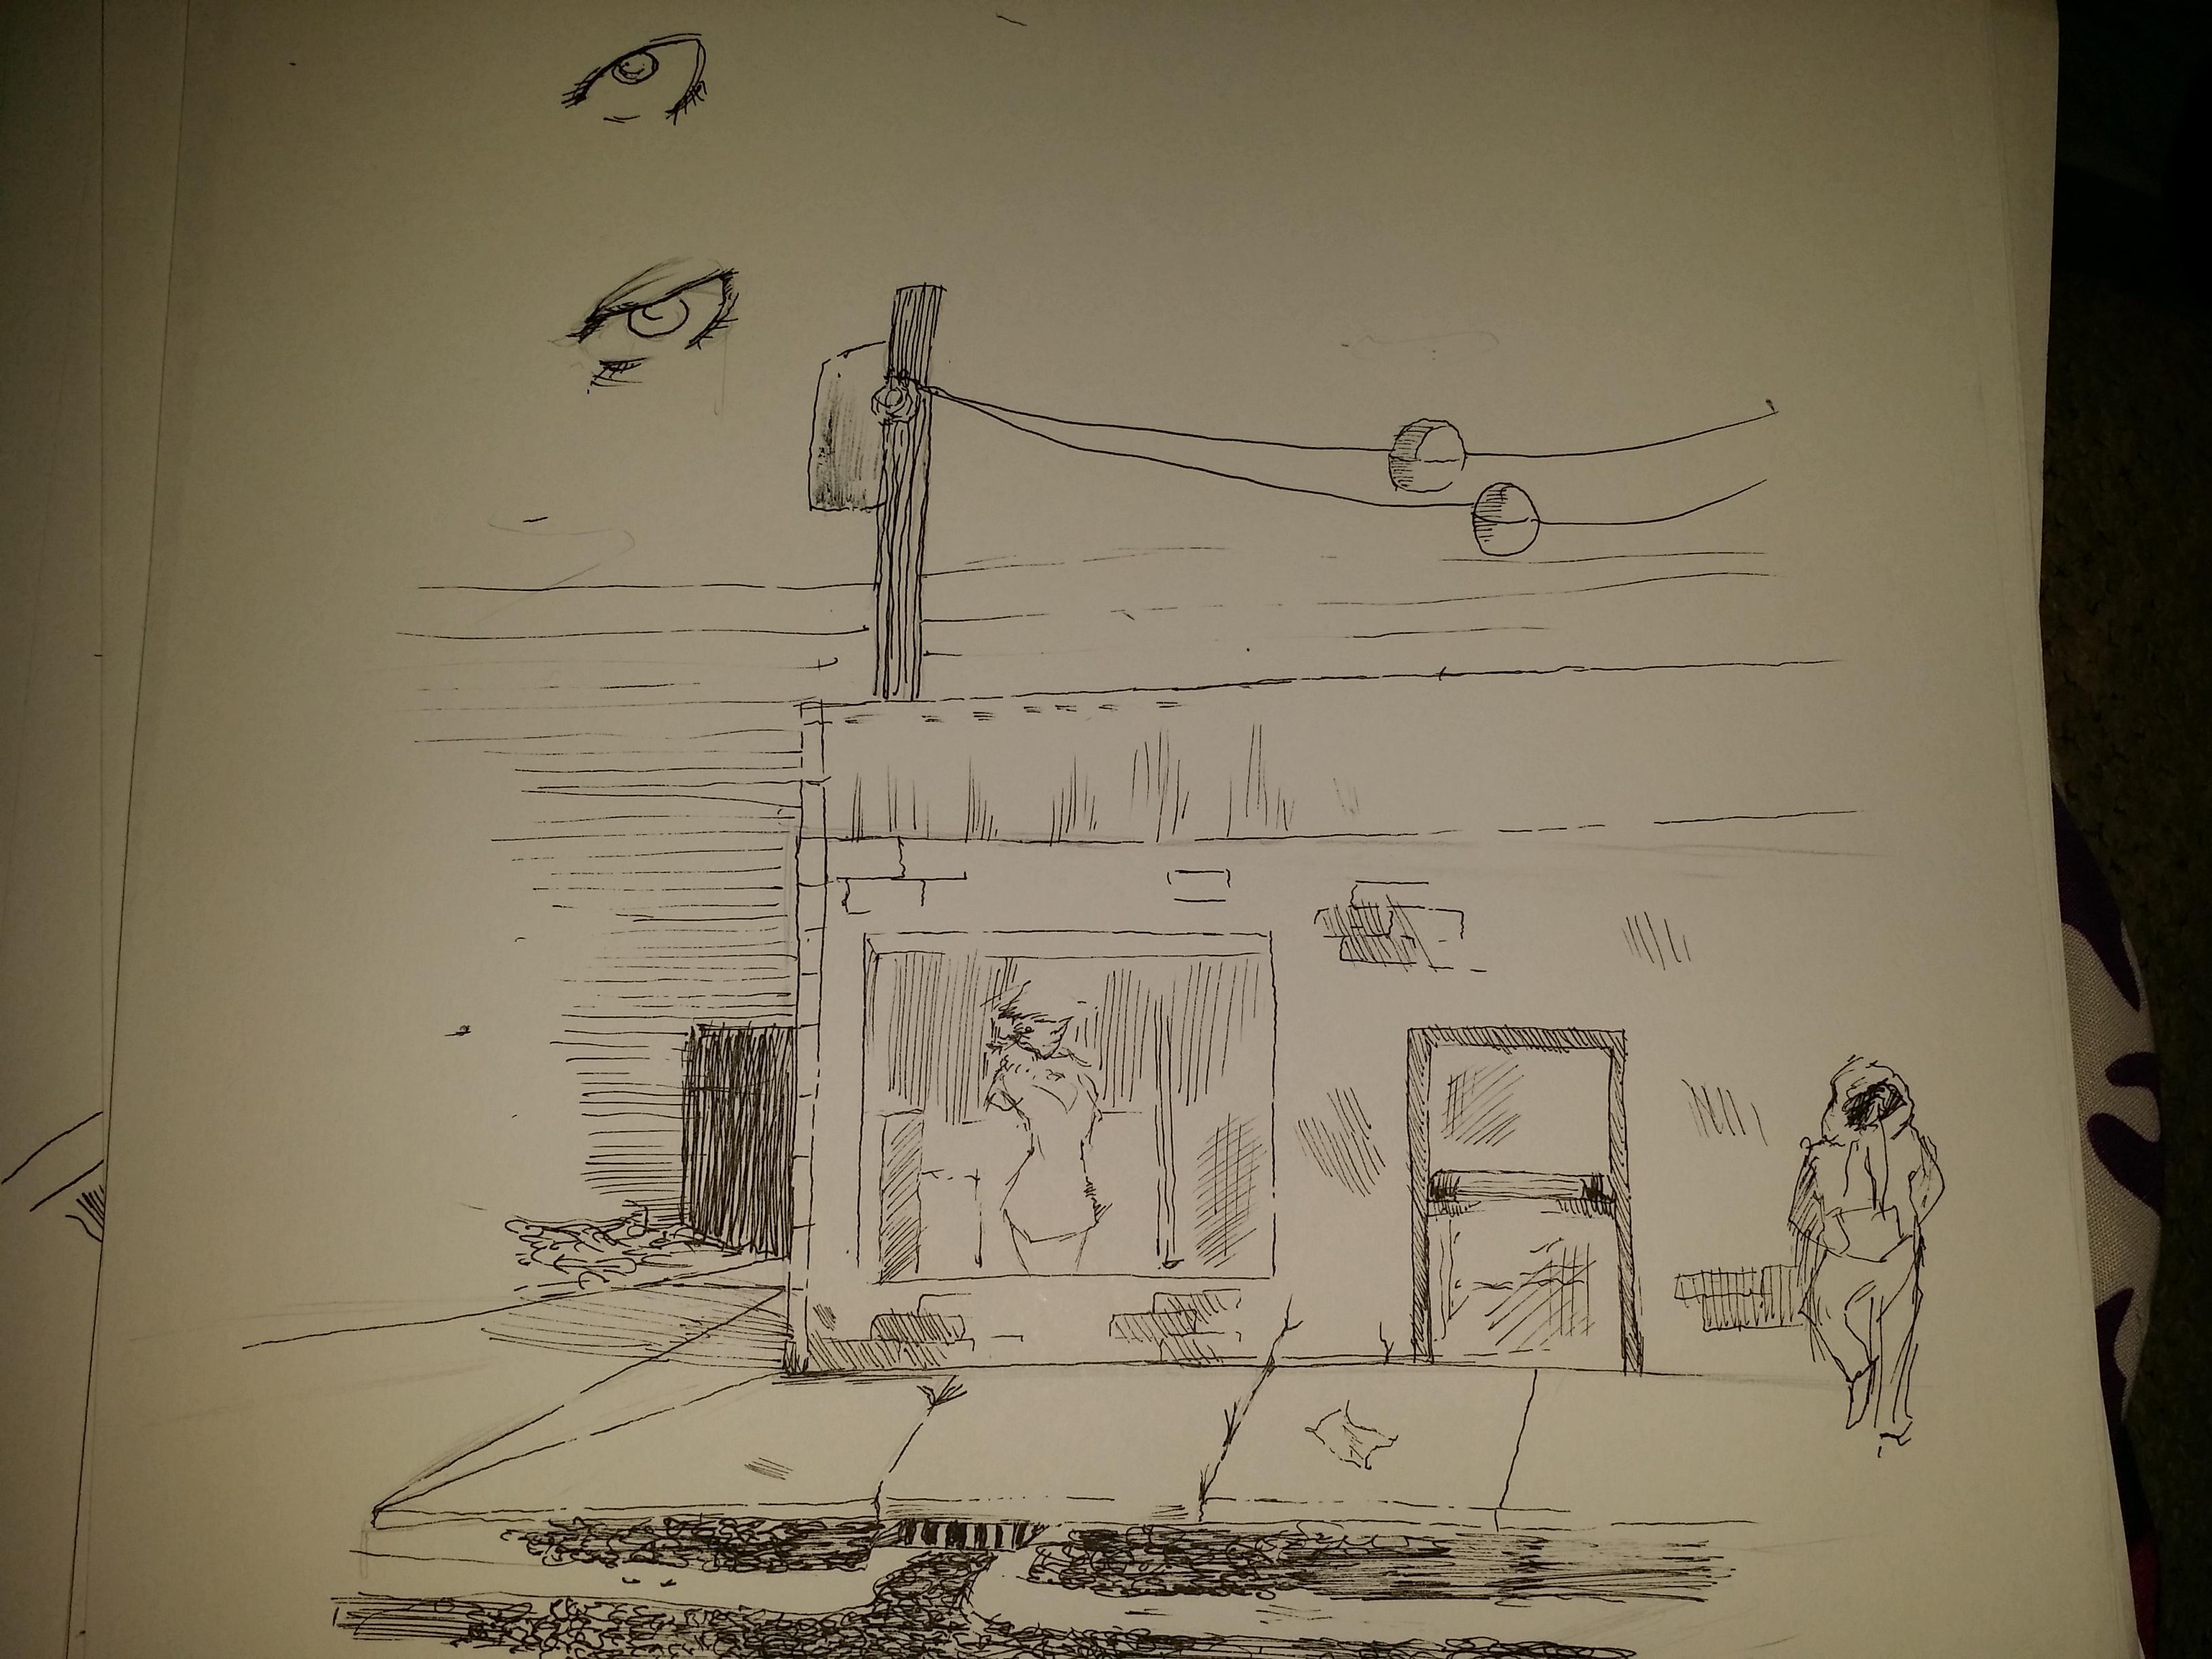 background sketch